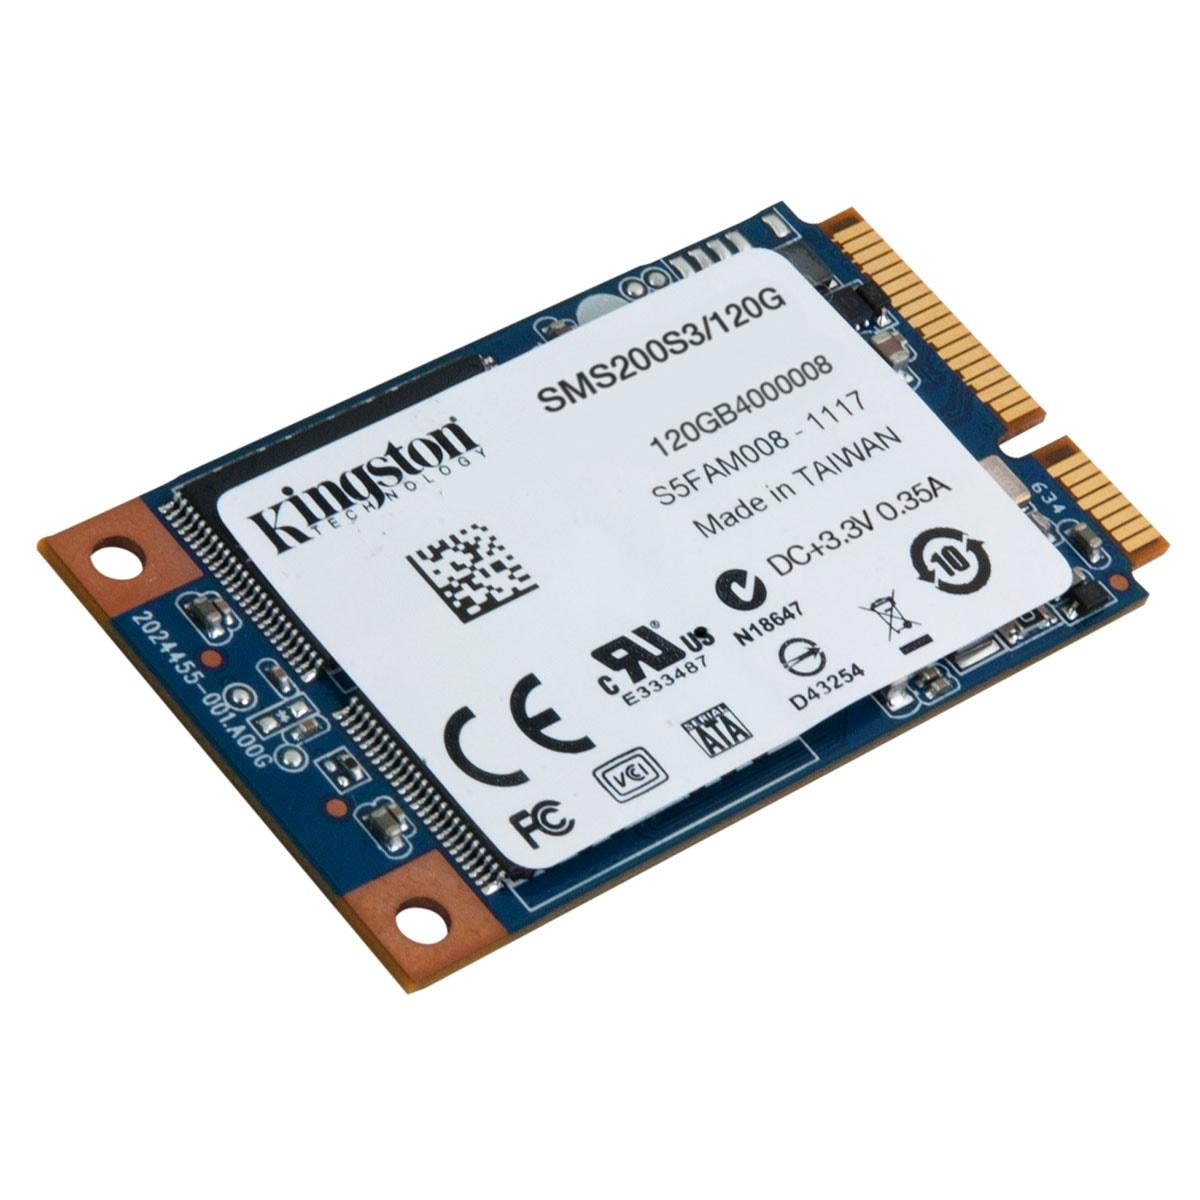 Kingston SMS200S3/120G 120-128Go - Disque SSD Kingston - 0